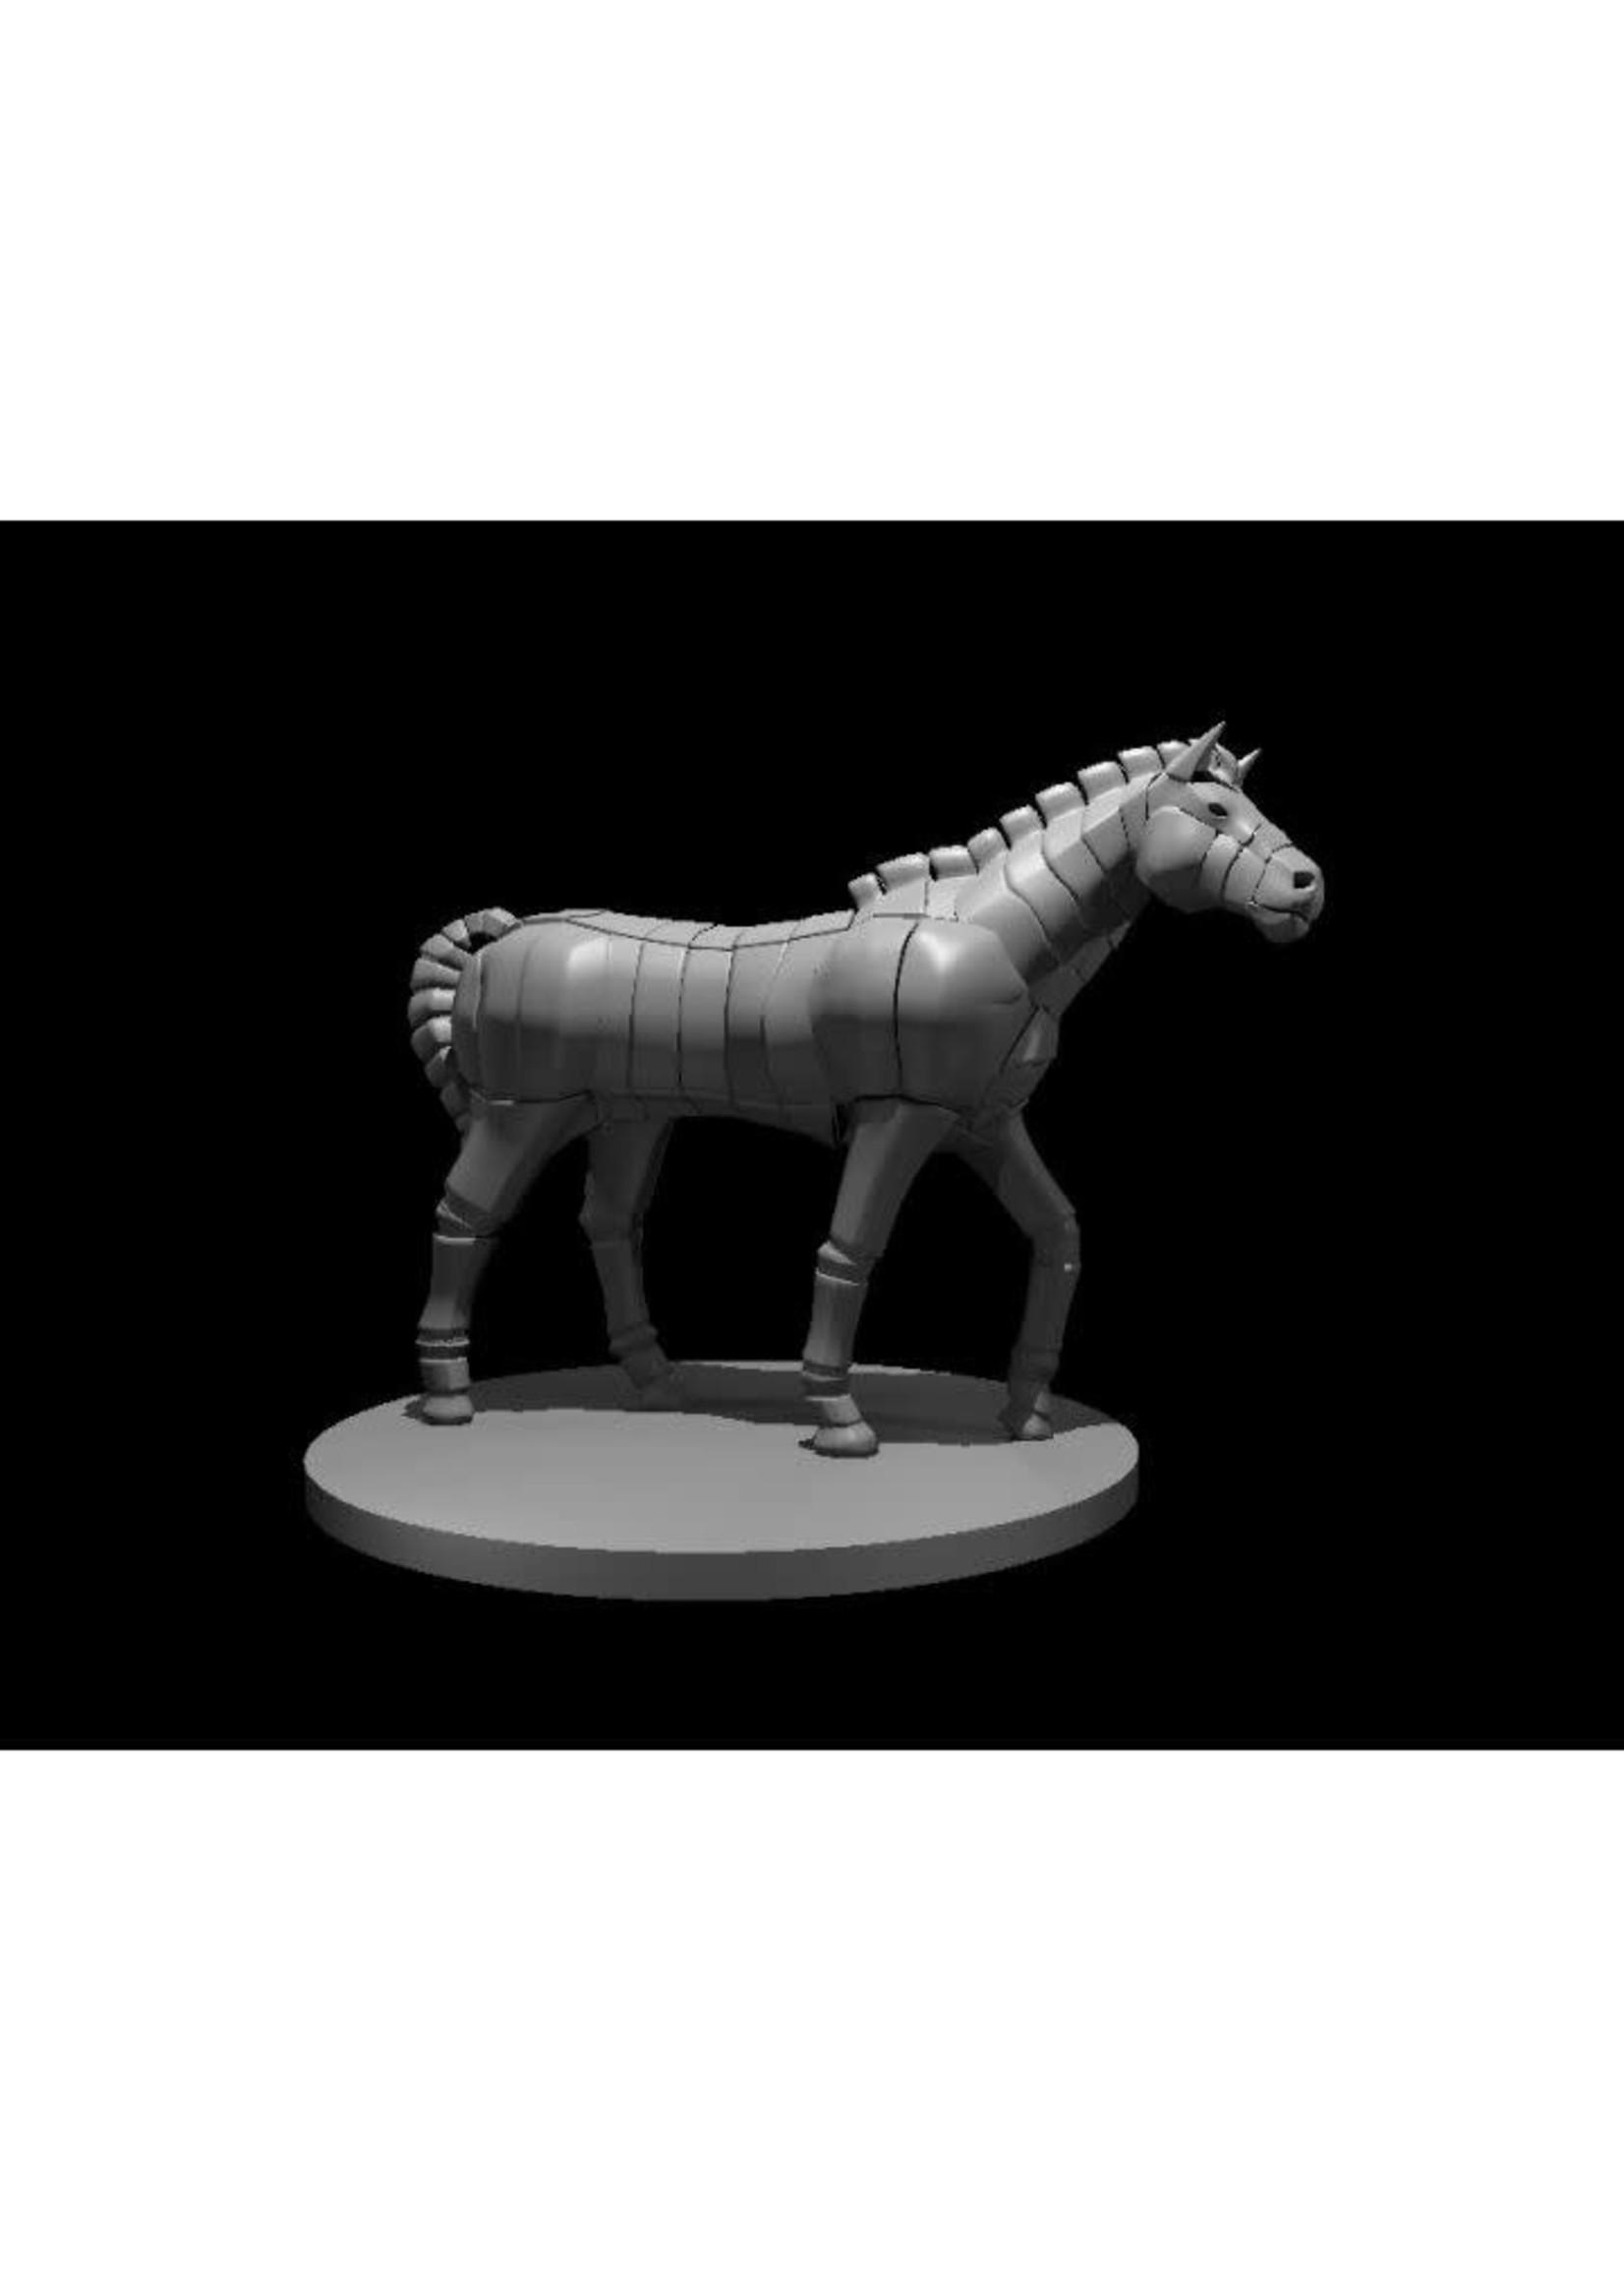 Clockwork Horse (Patreon Mz4250)